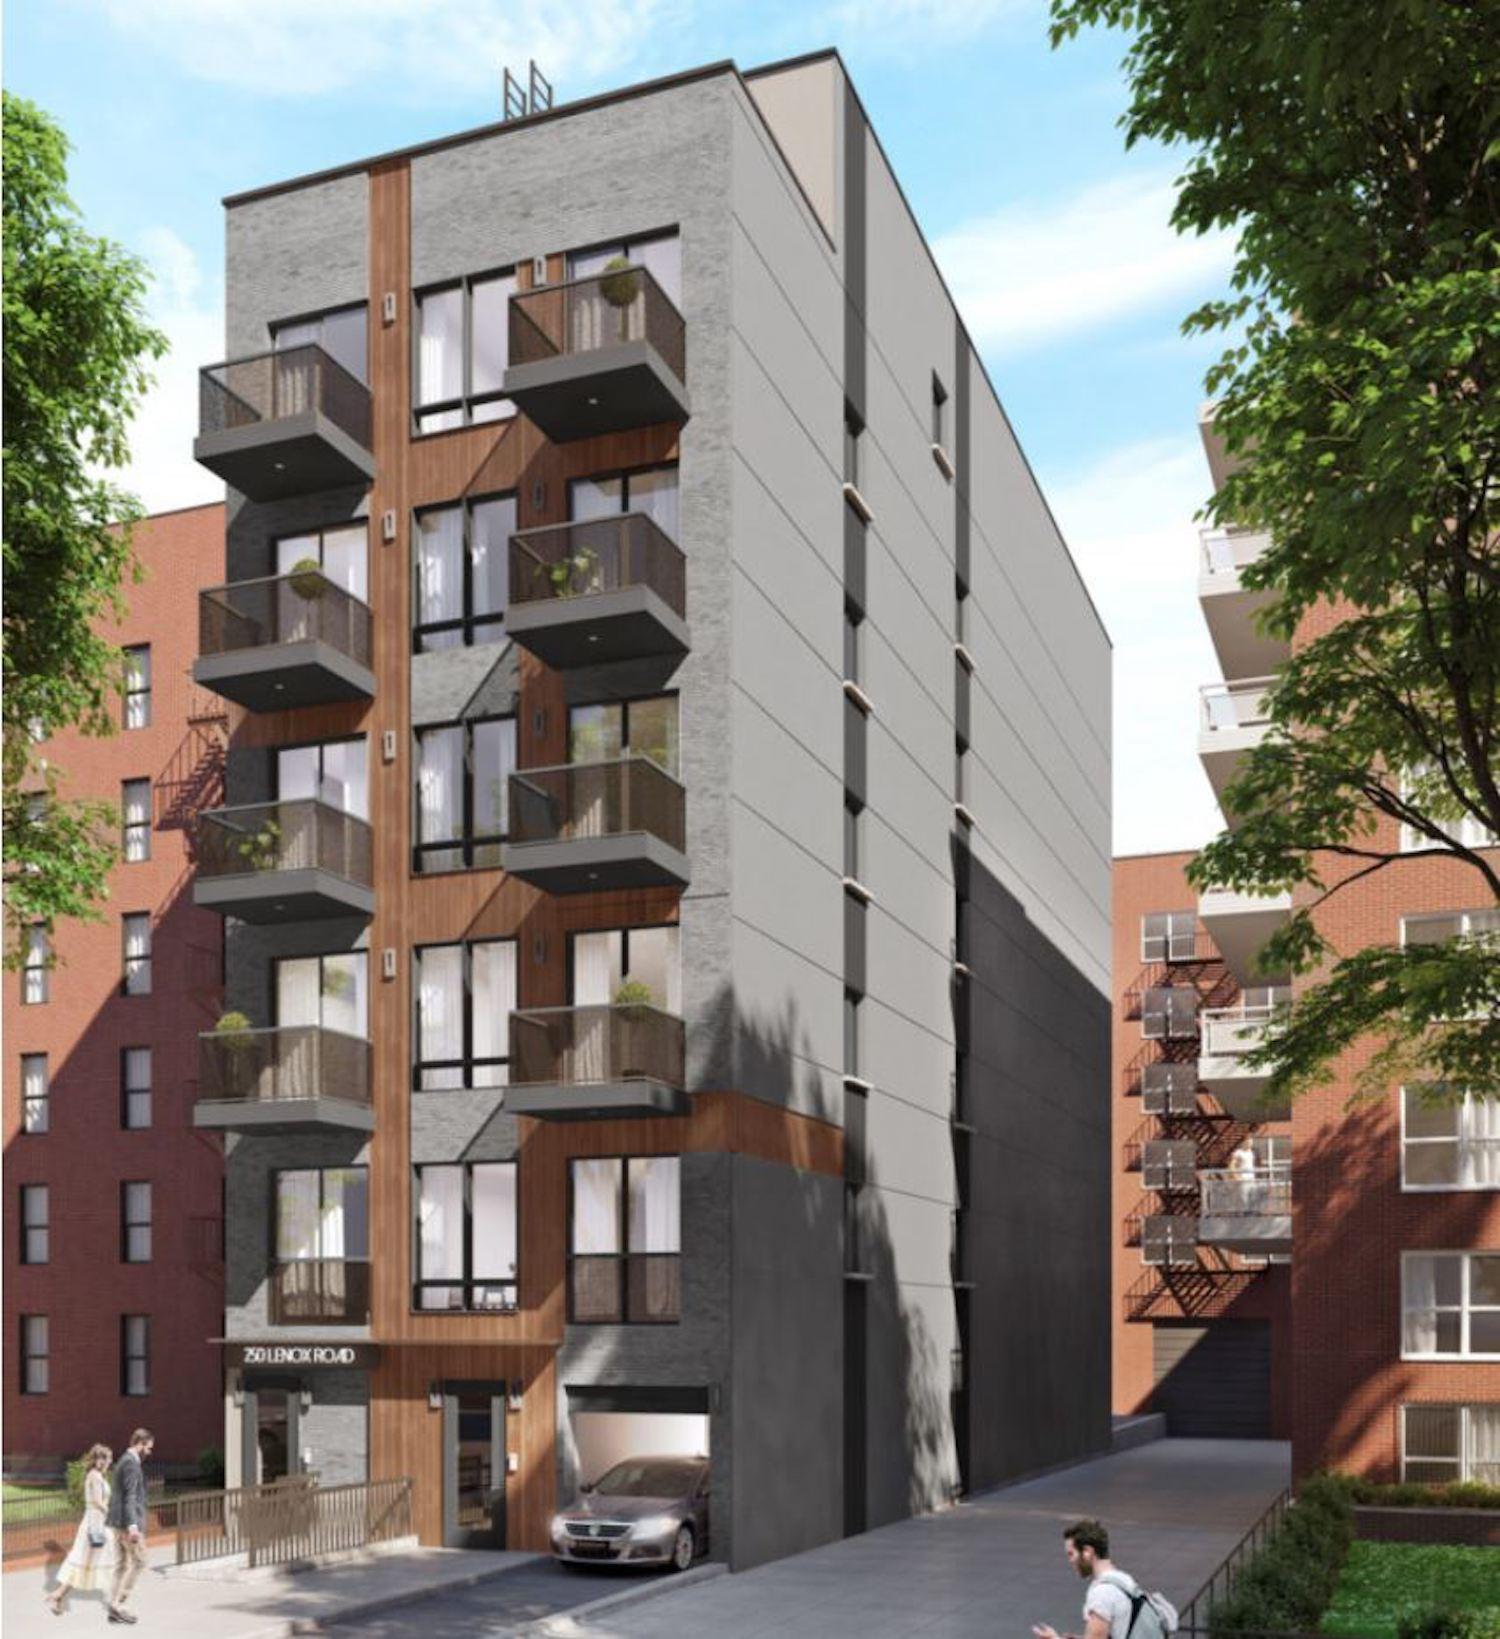 250 Lenox Road in East Flatbush, Brooklyn. All photos courtesy of NY Housing Connect